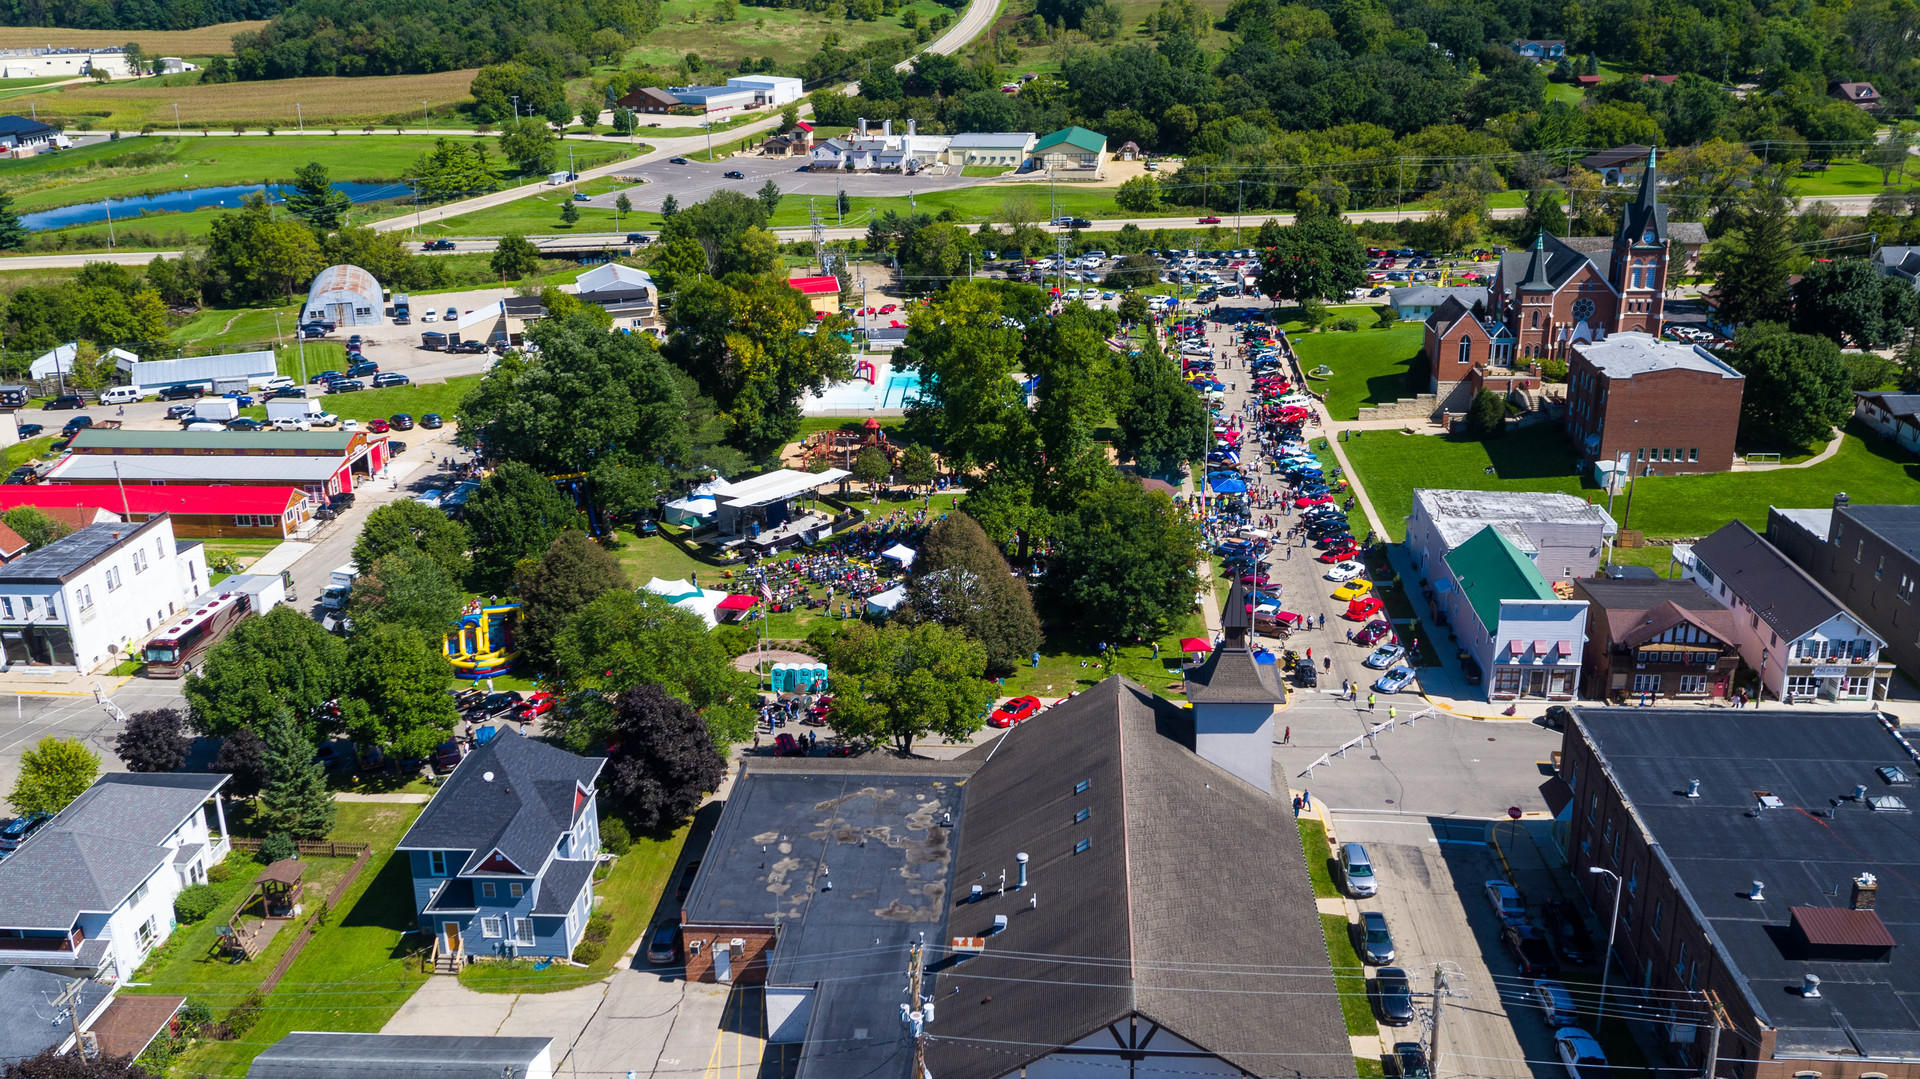 14th Annual New Glarus Family Fest & Car Show